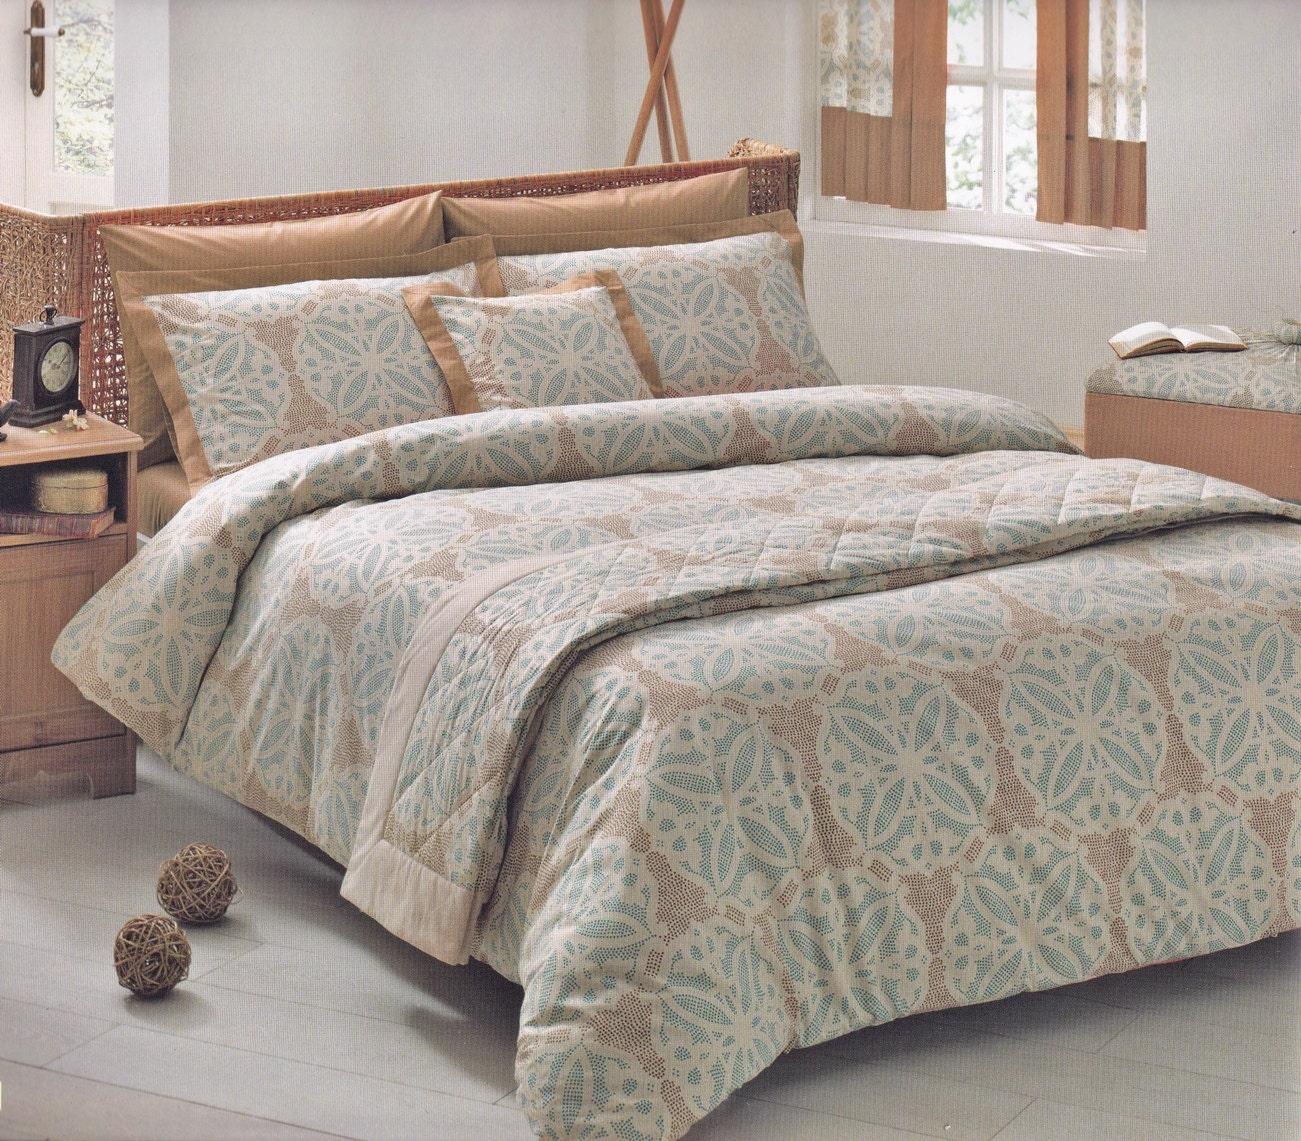 Moroccan Tile Bedding Set in Teal Blue Brown Beige by ...